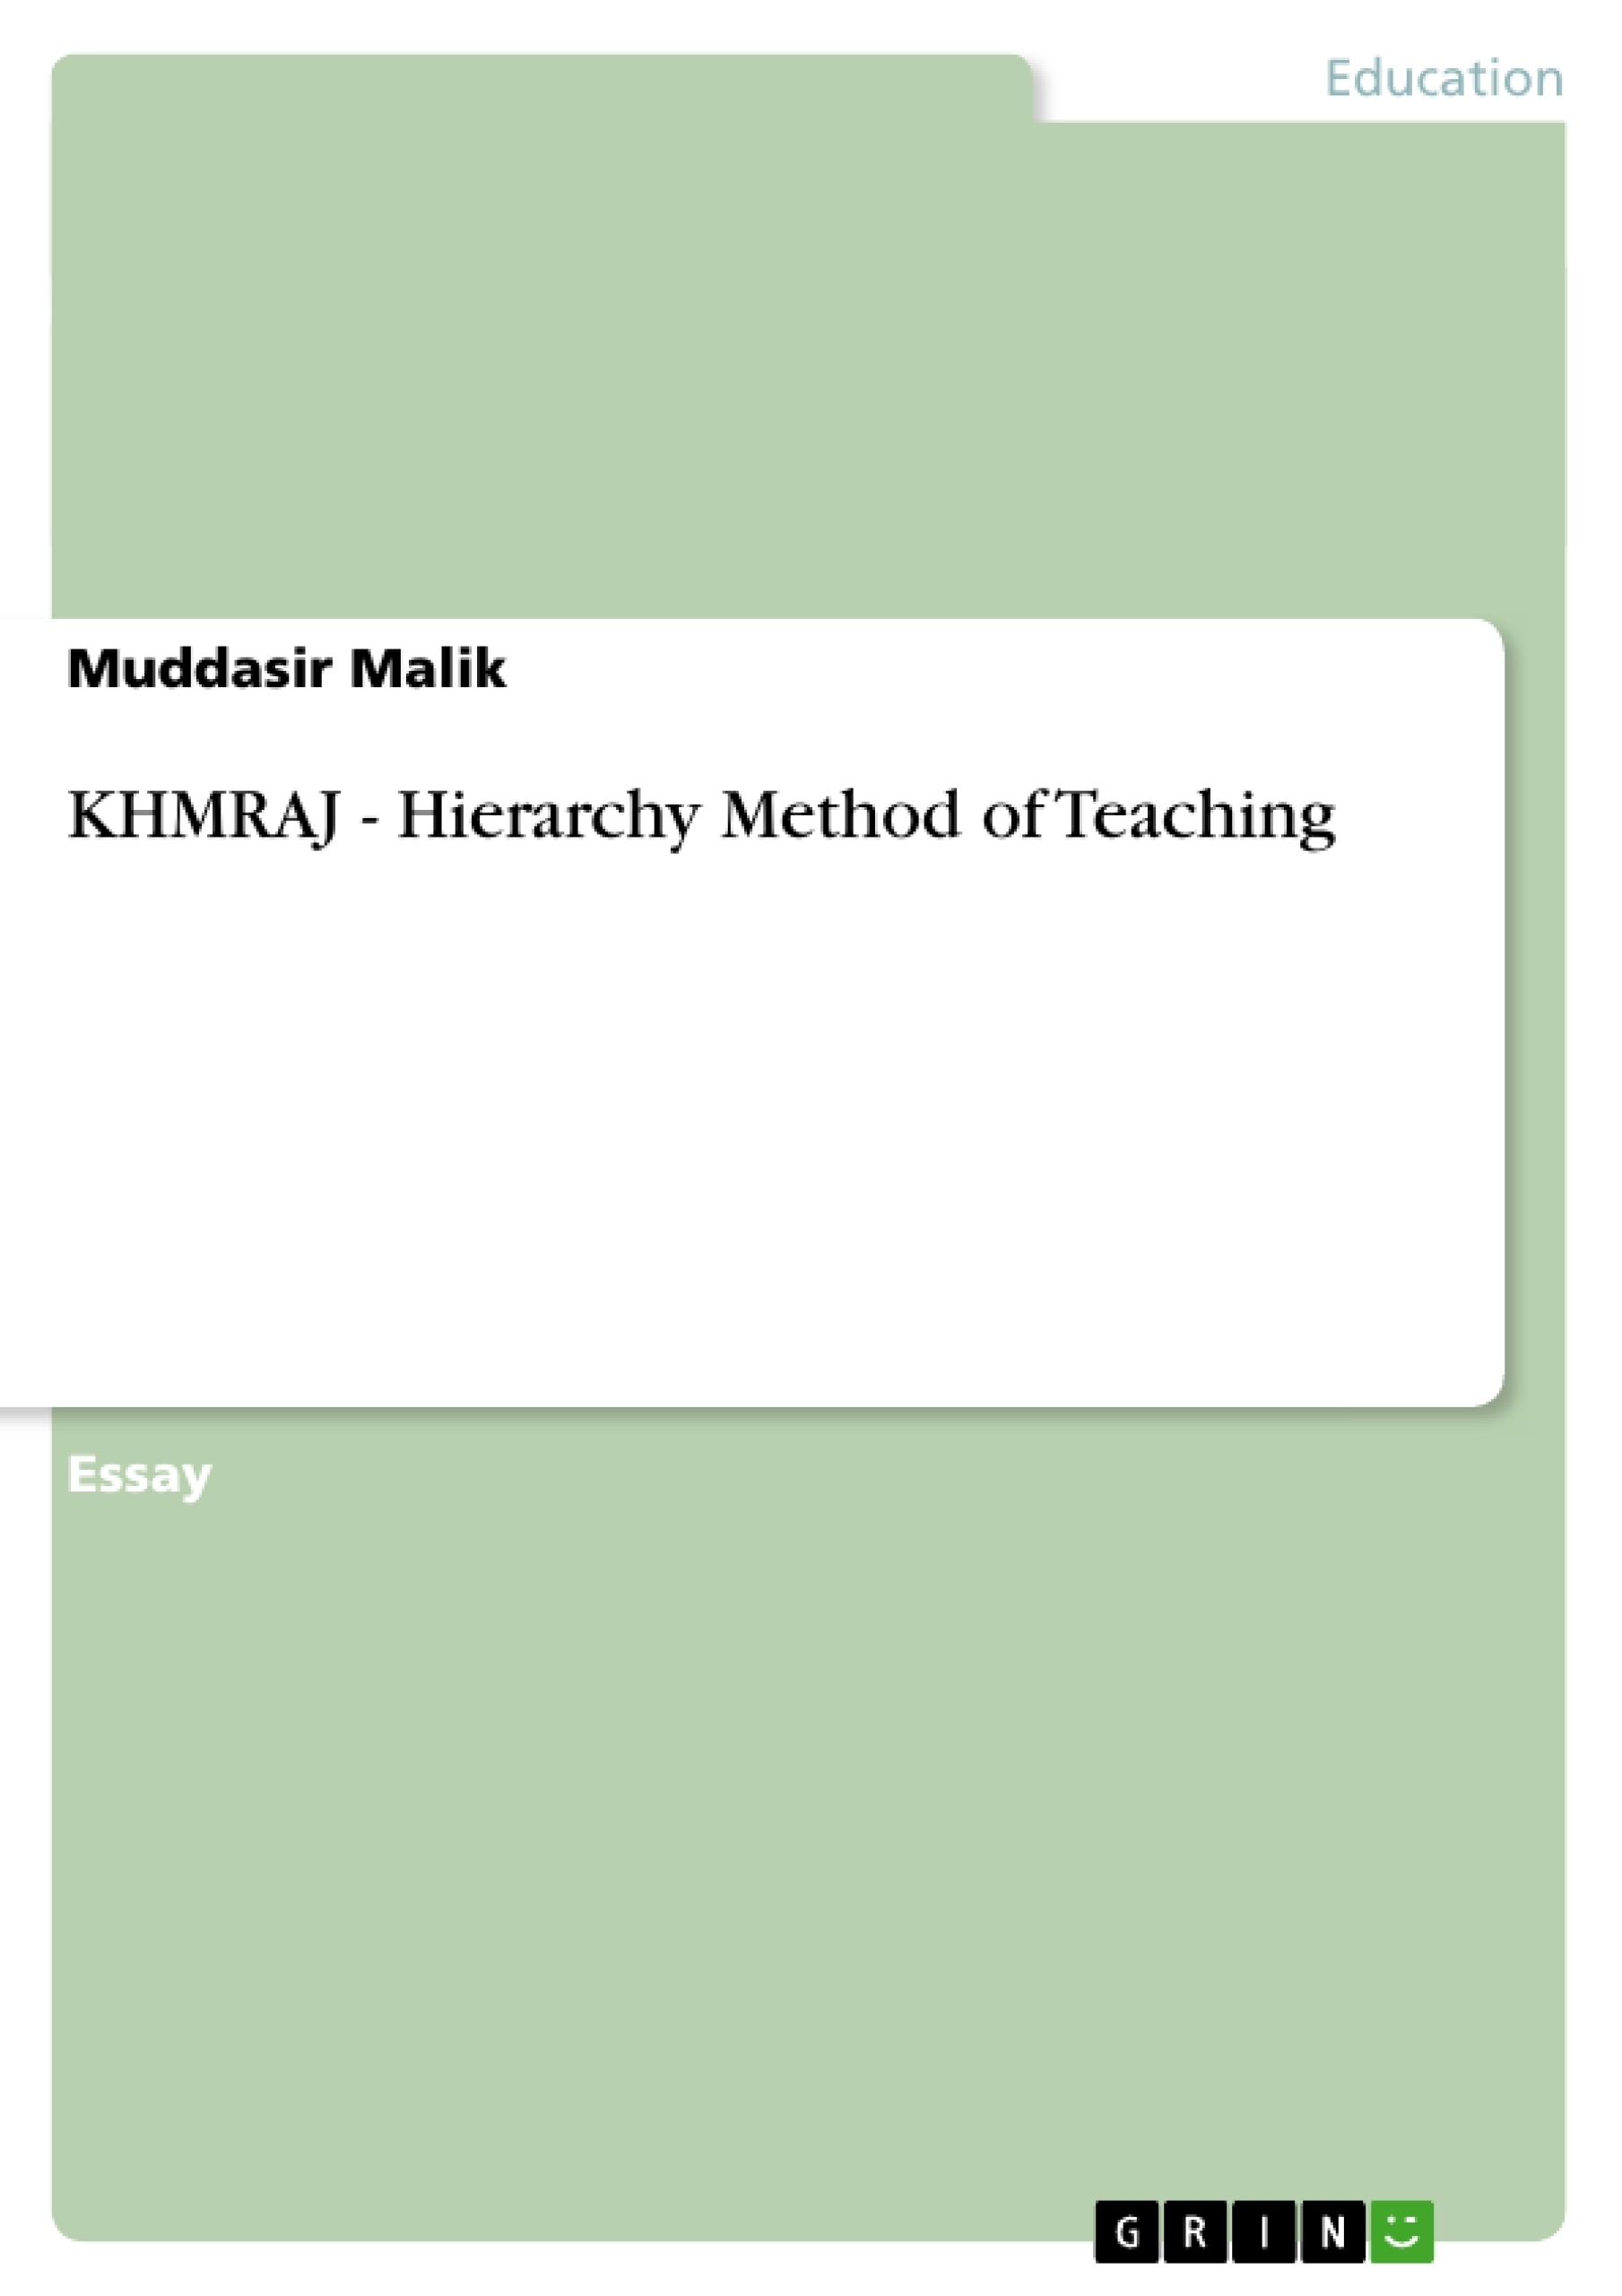 Title: KHMRAJ - Hierarchy Method of Teaching